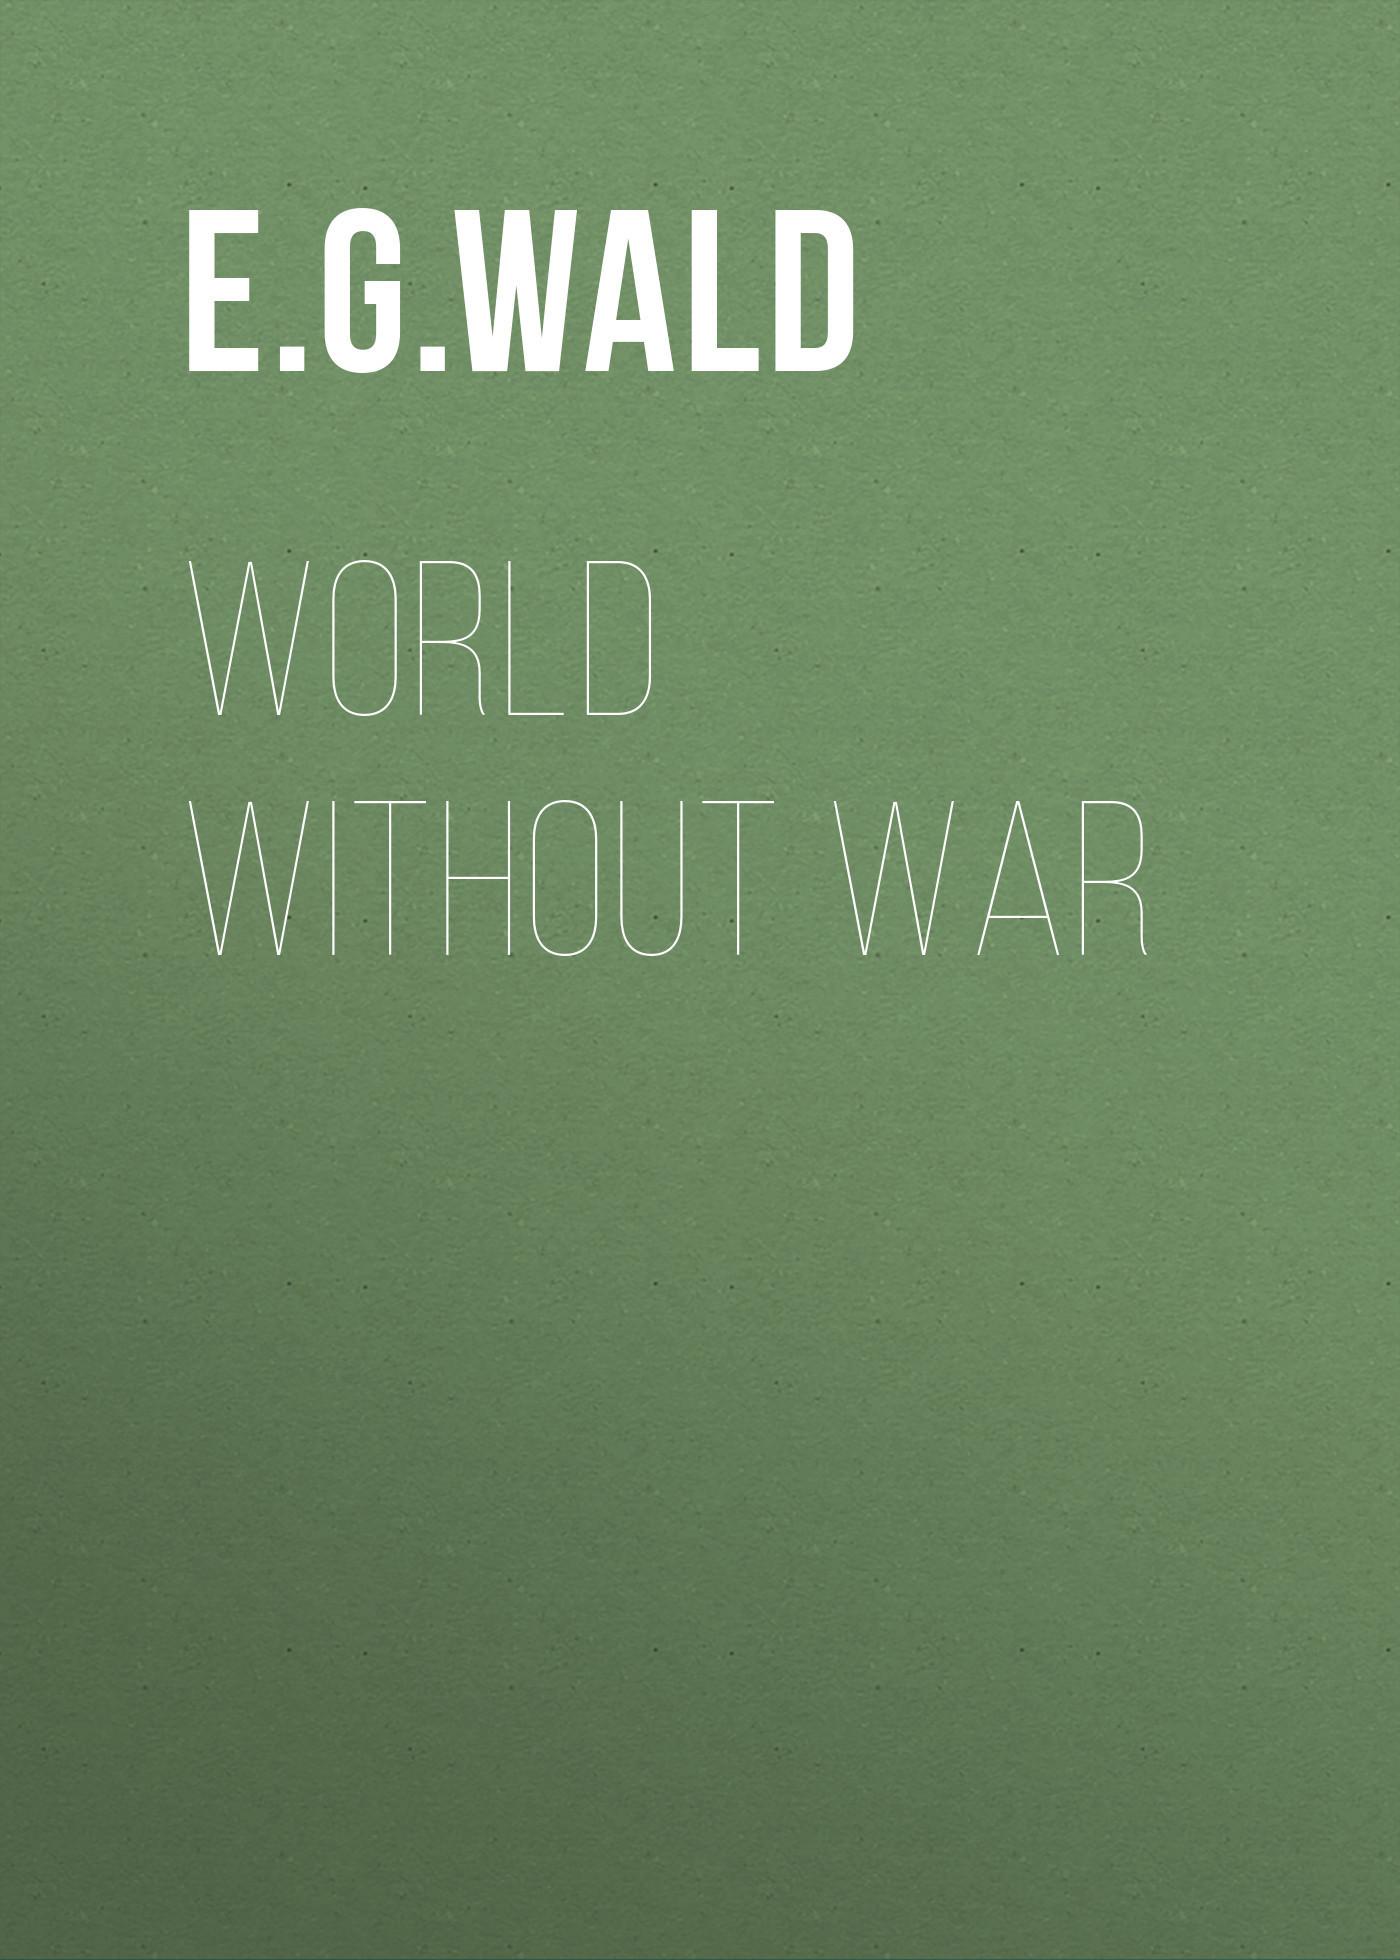 E. G. von Wald World Without War matthew wald the history of matthew wald